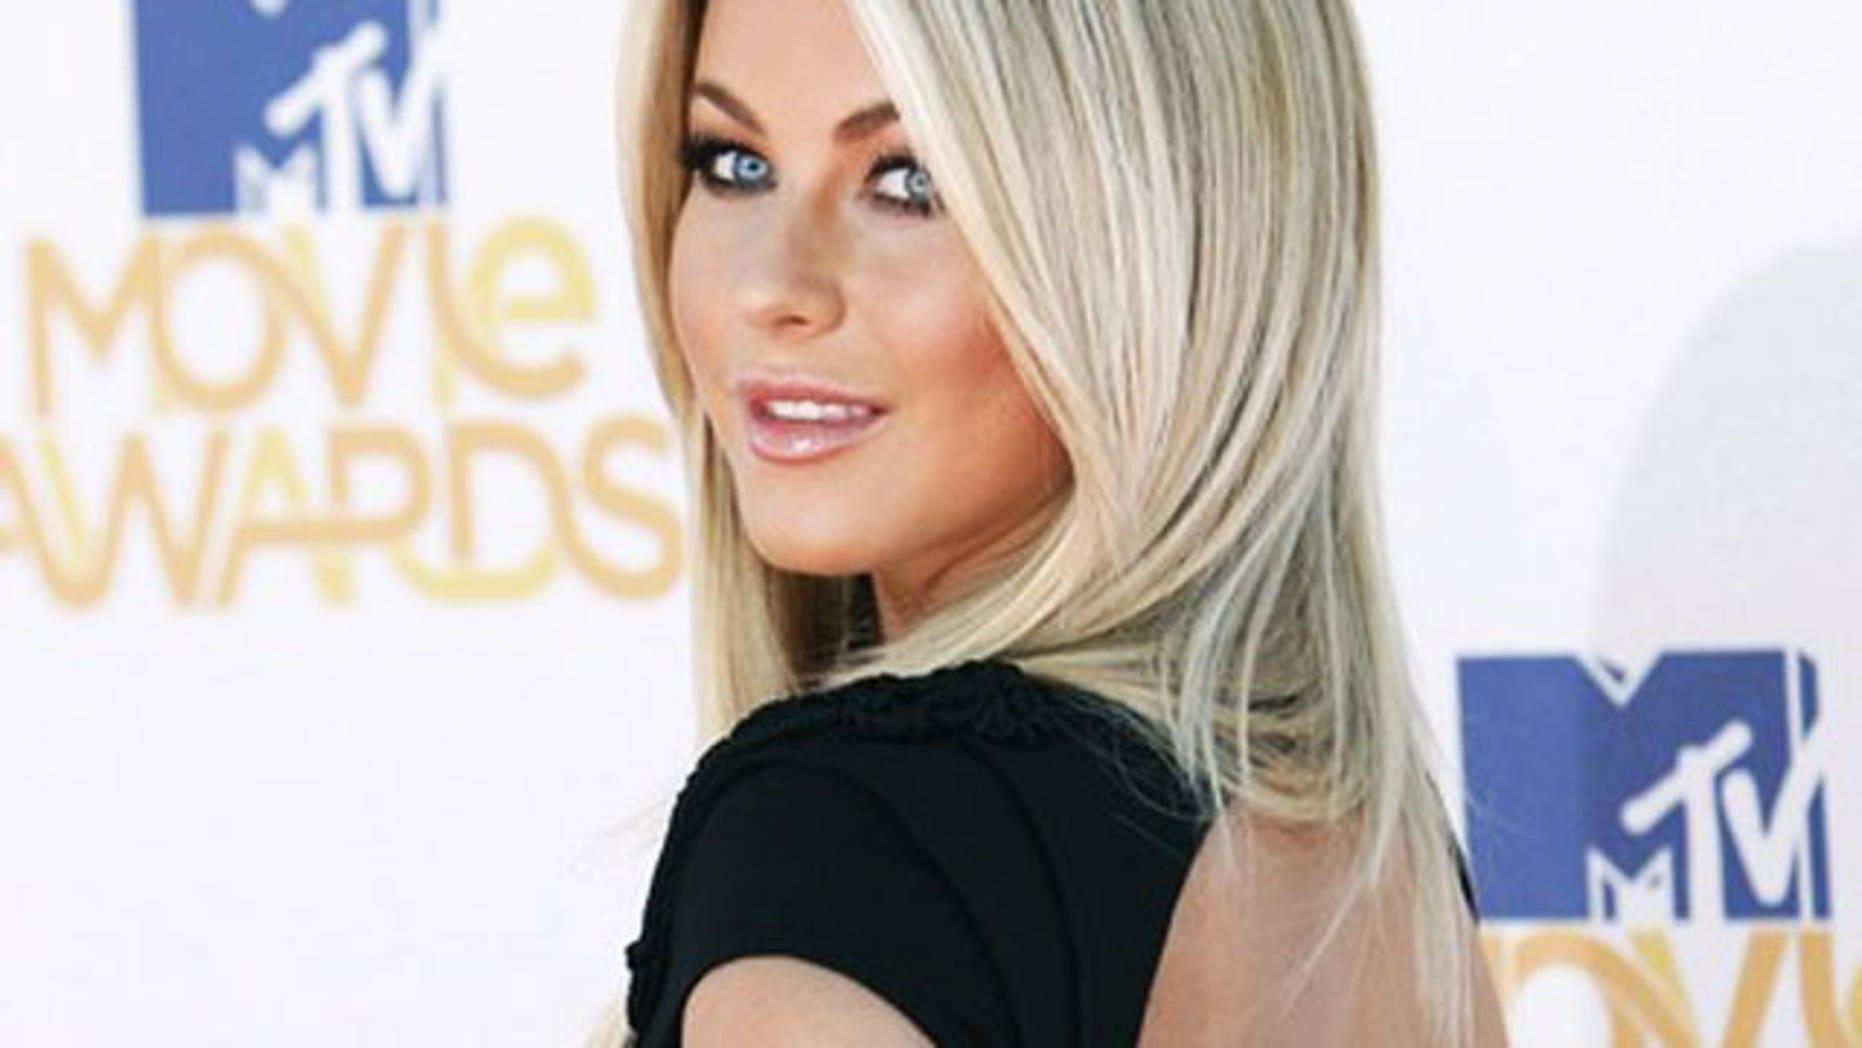 June 6: Singer and dancer Julianne Hough arrives at the 2010 MTV Movie Awards in Los Angeles. (Reuters)